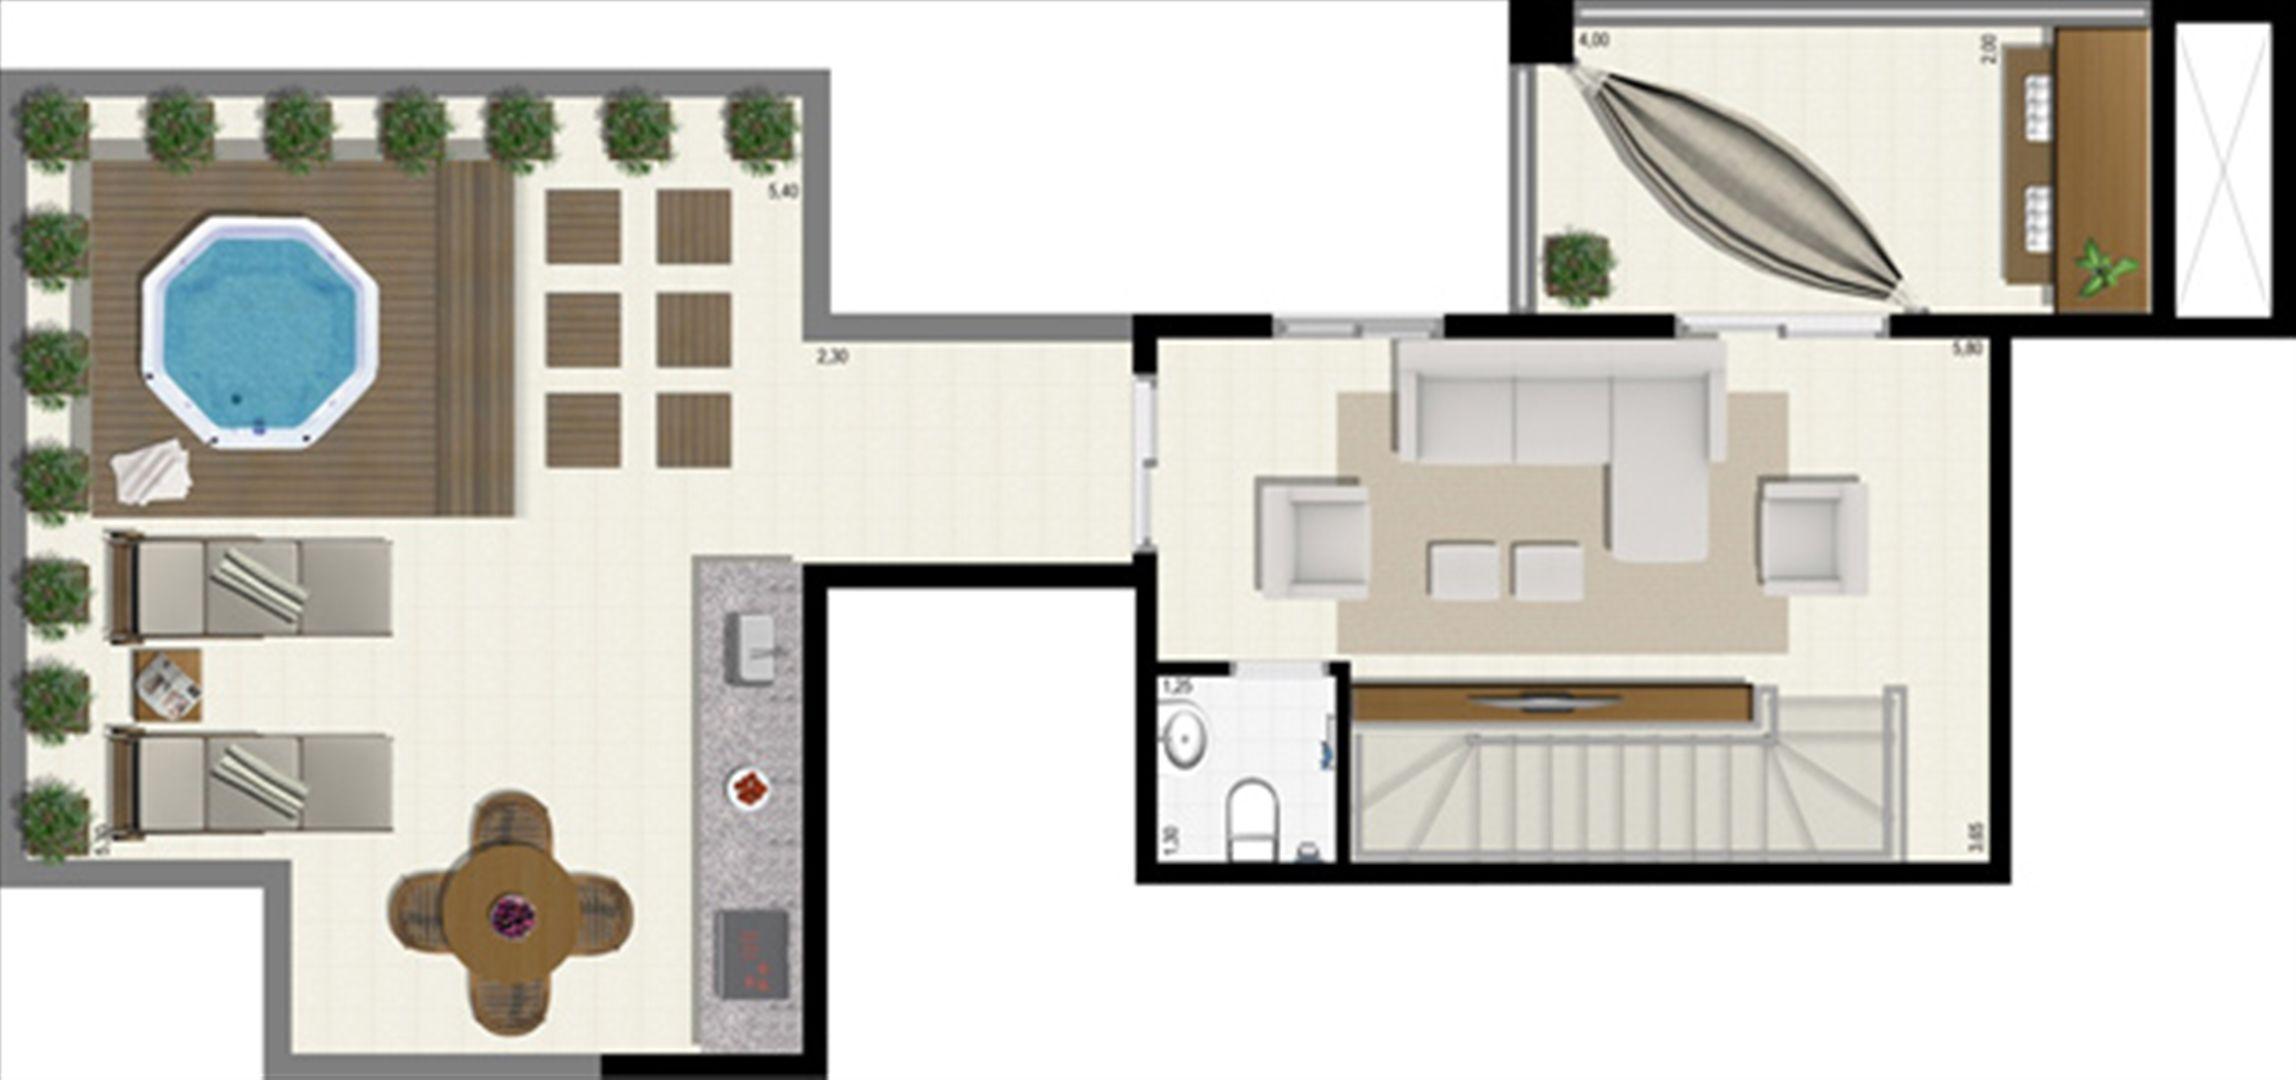 Planta duplex 191 m² - superior | L´Acqua Condominium Club – Apartamentoem  Neópolis - Natal - Rio Grande do Norte